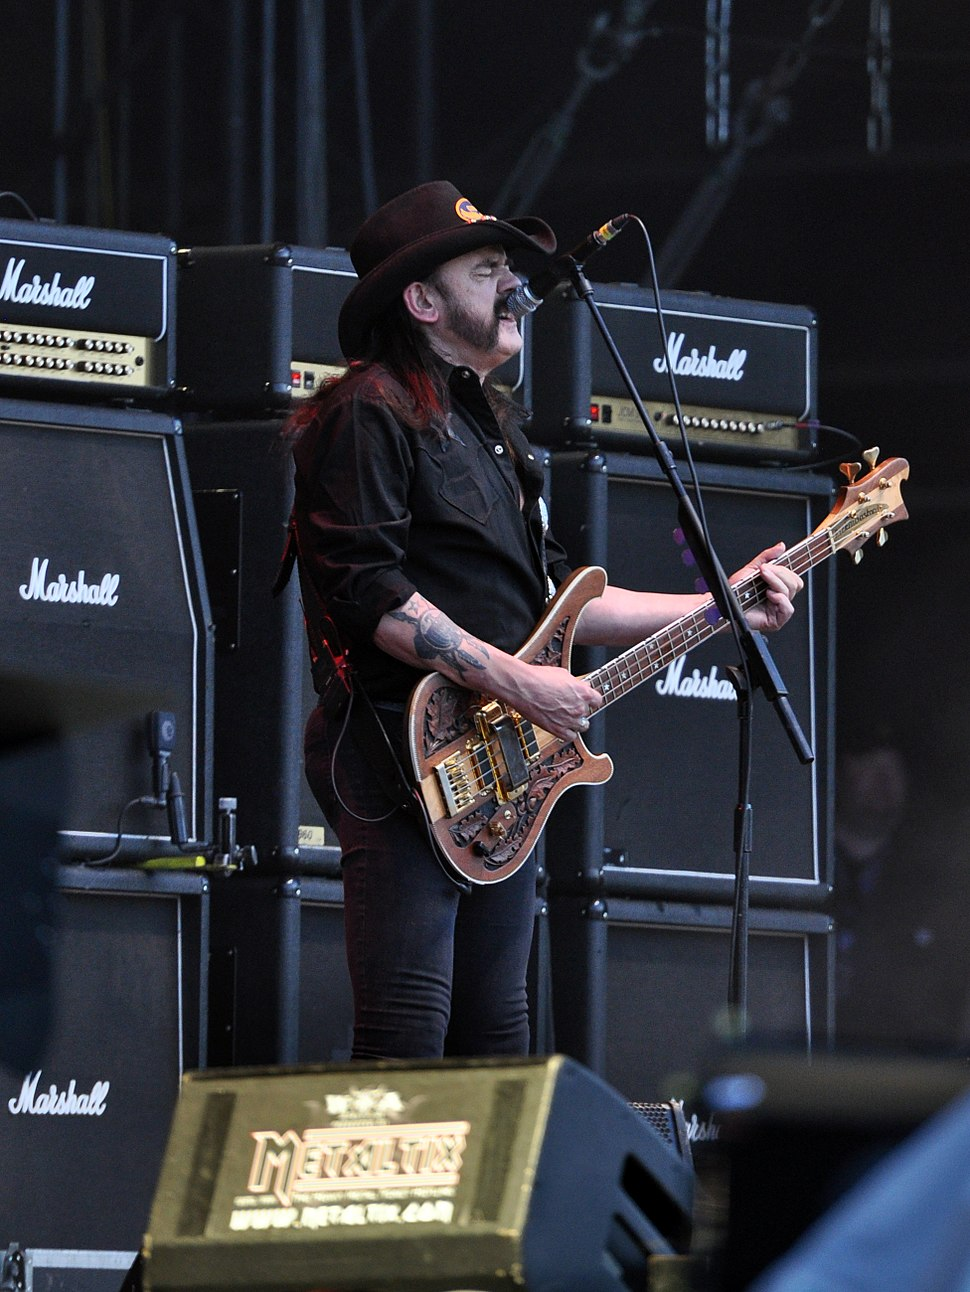 Lemmy Kilmister of Mot%C3%B6rhead at Wacken Open Air 2013